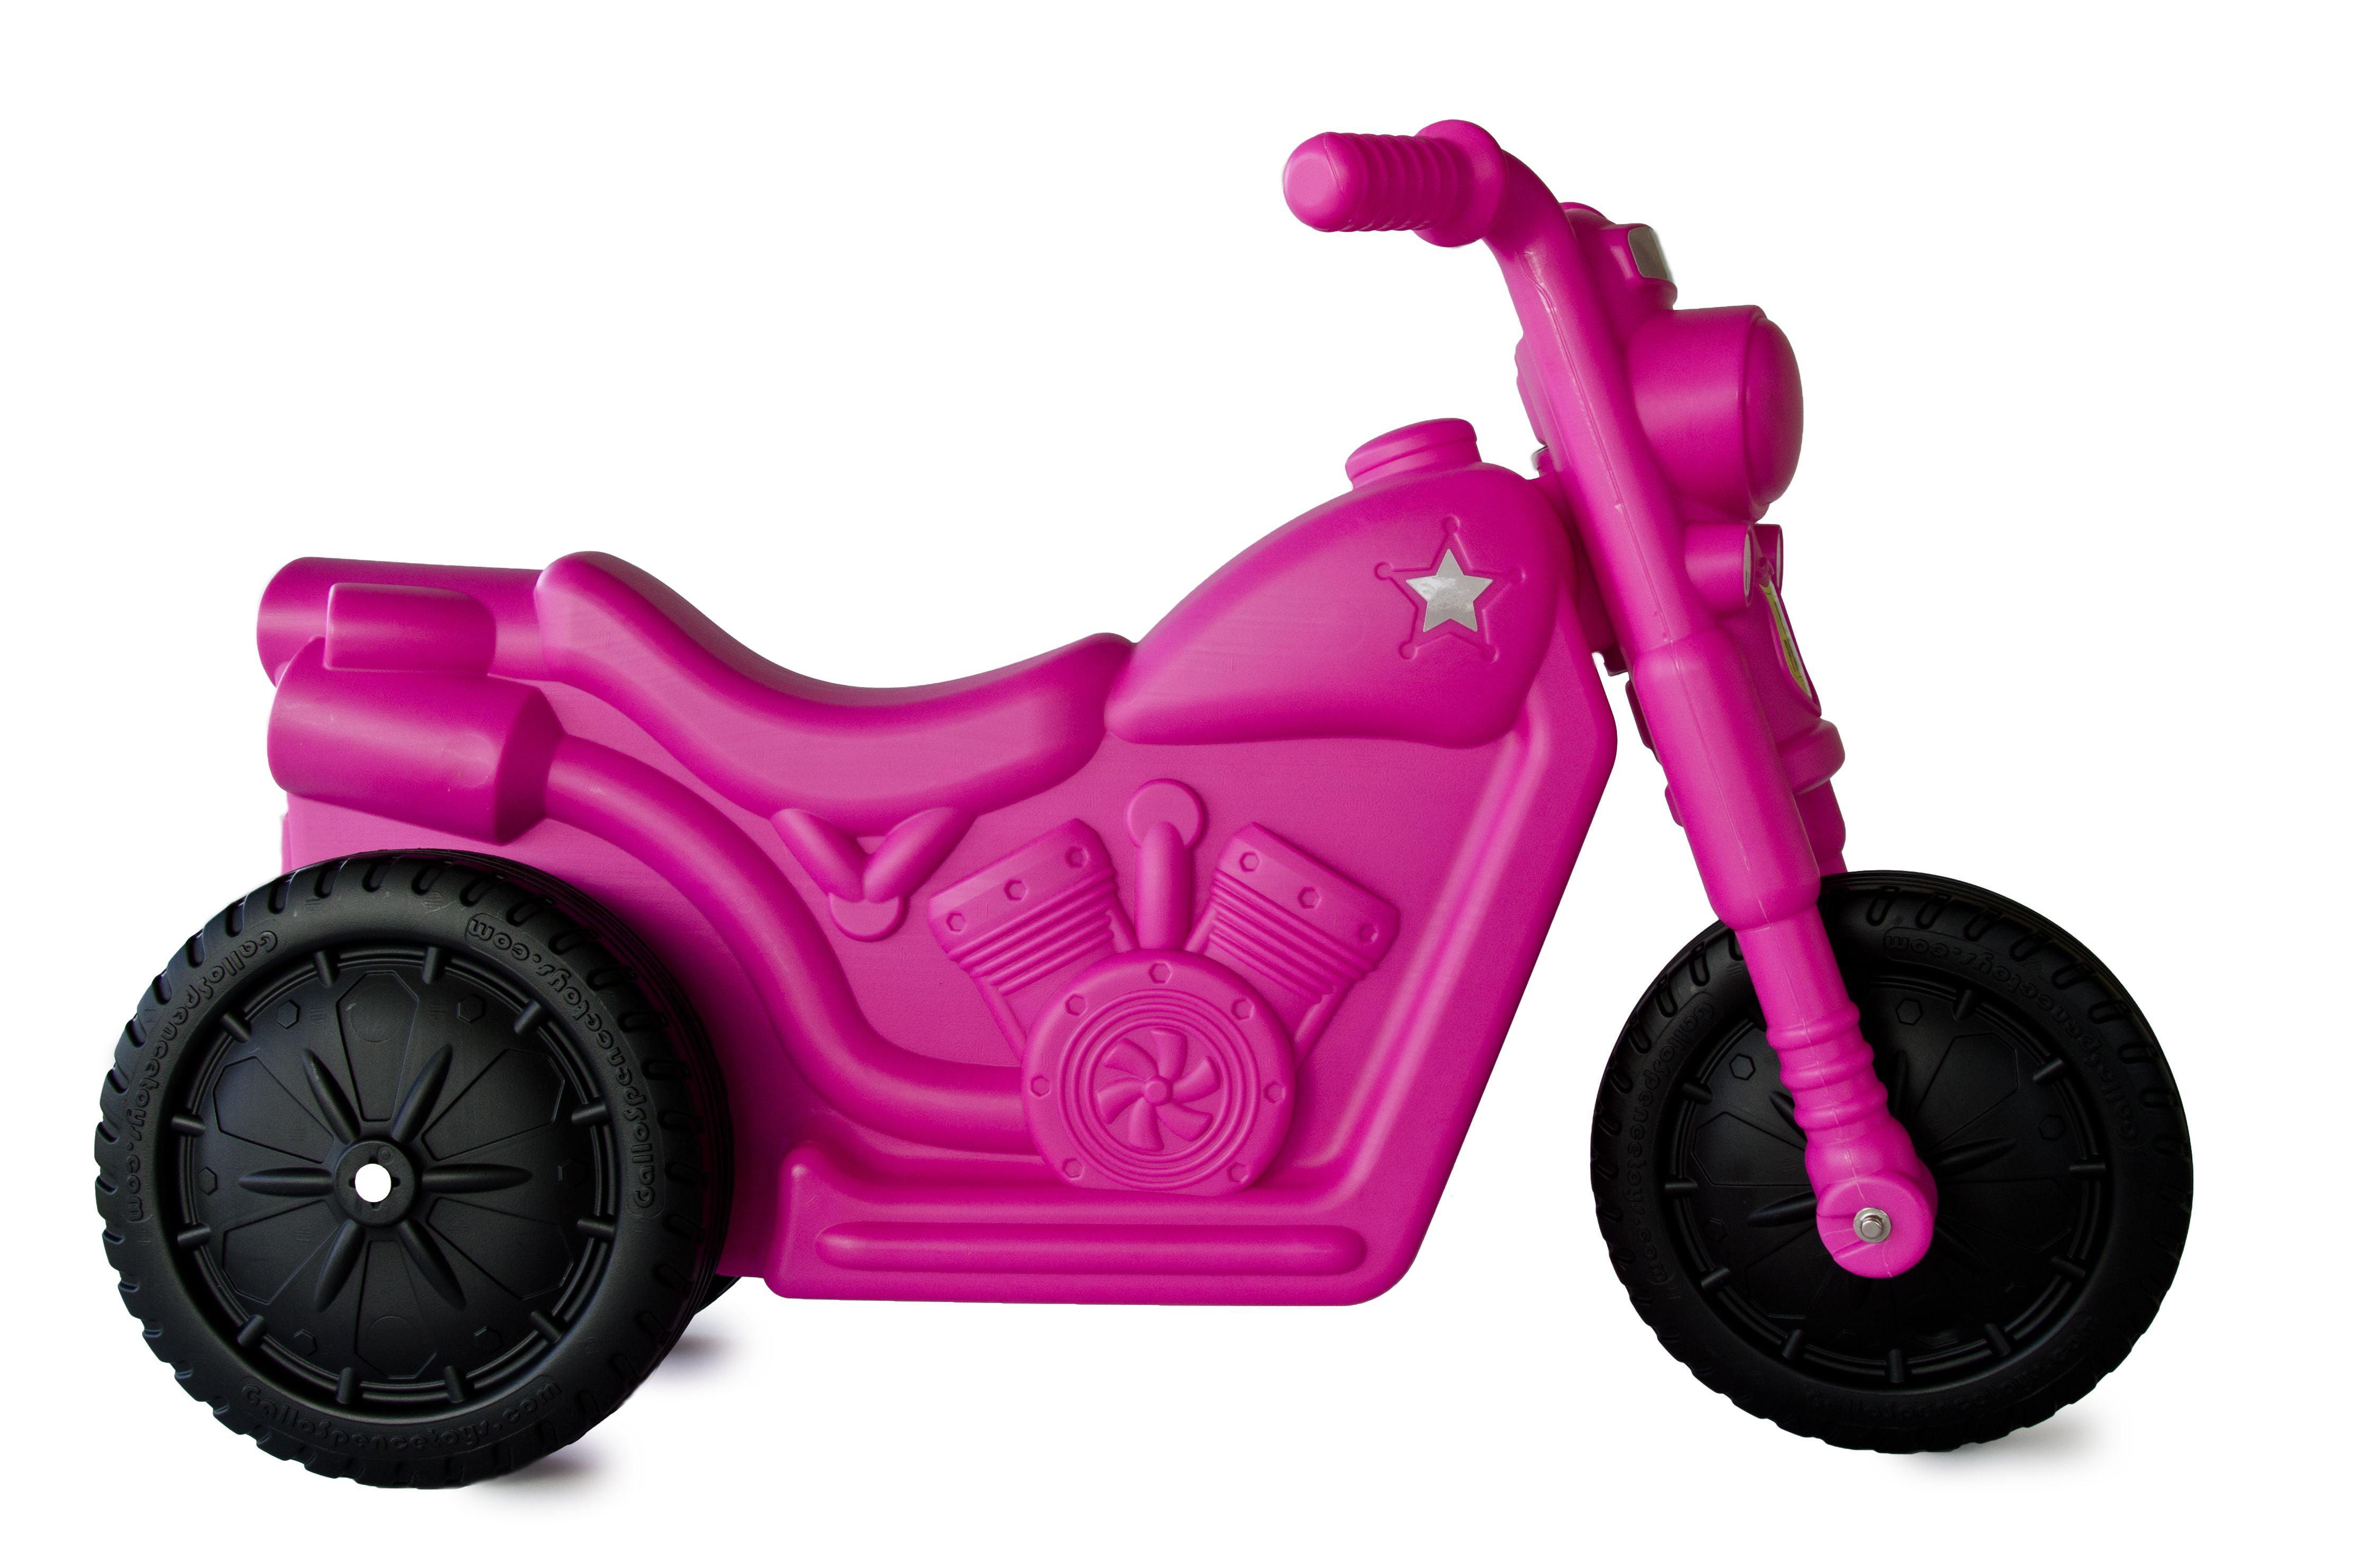 Piki Piki Bike - Walmart.com